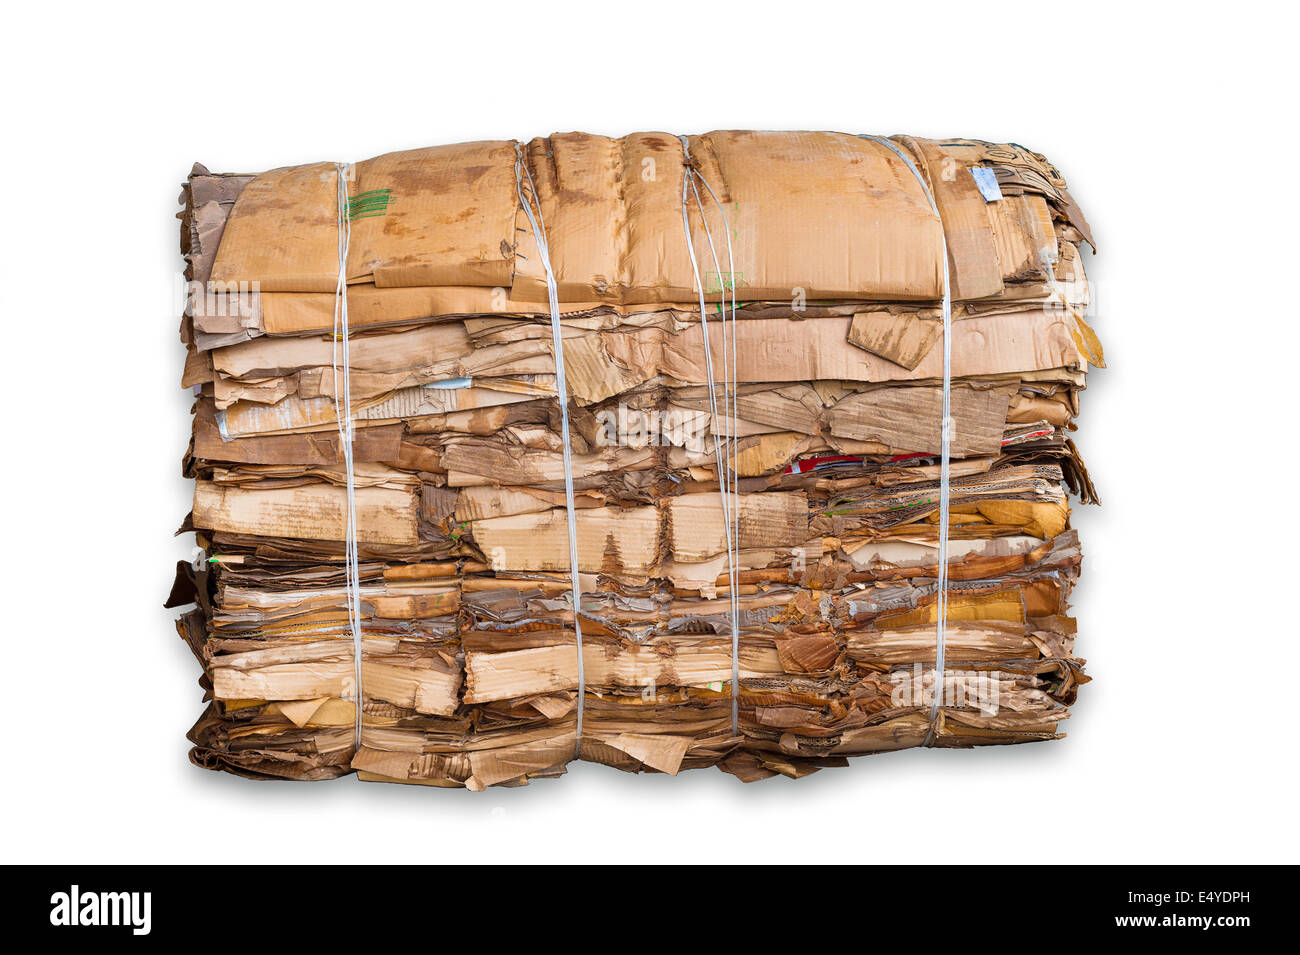 how to make a cardboard bail